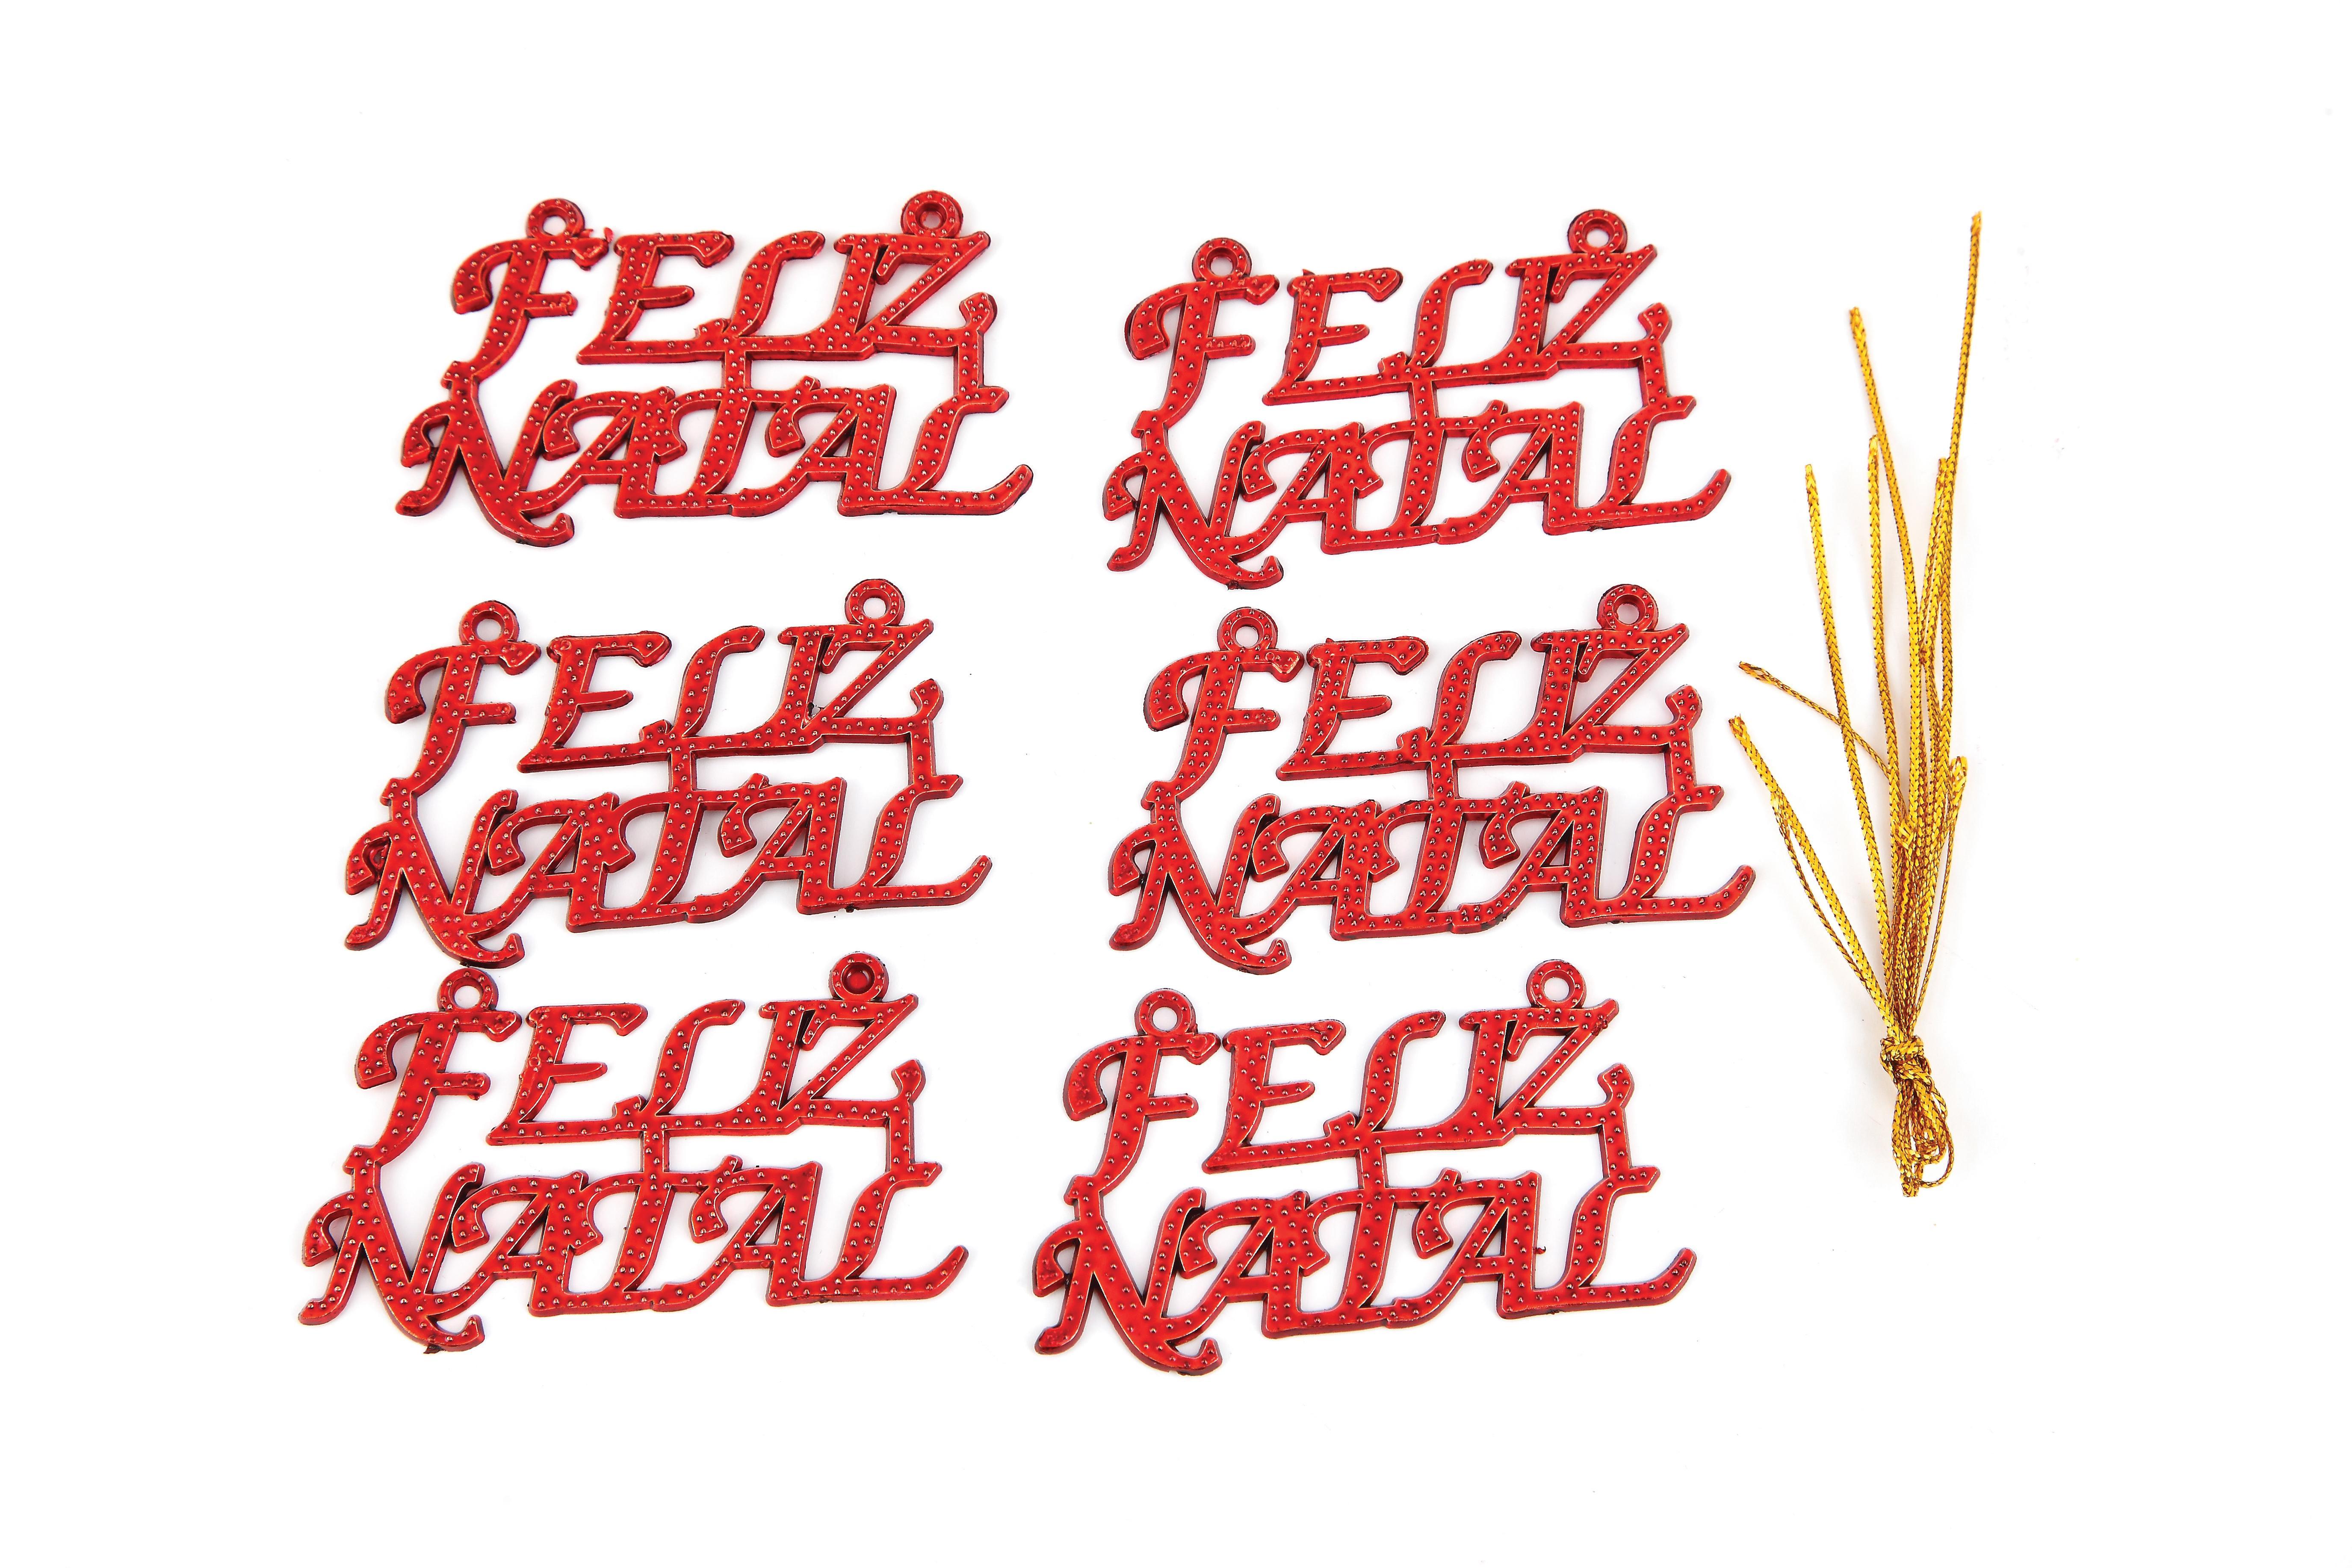 ENFEITE FELIZ NATAL C/3 UN  7X,3